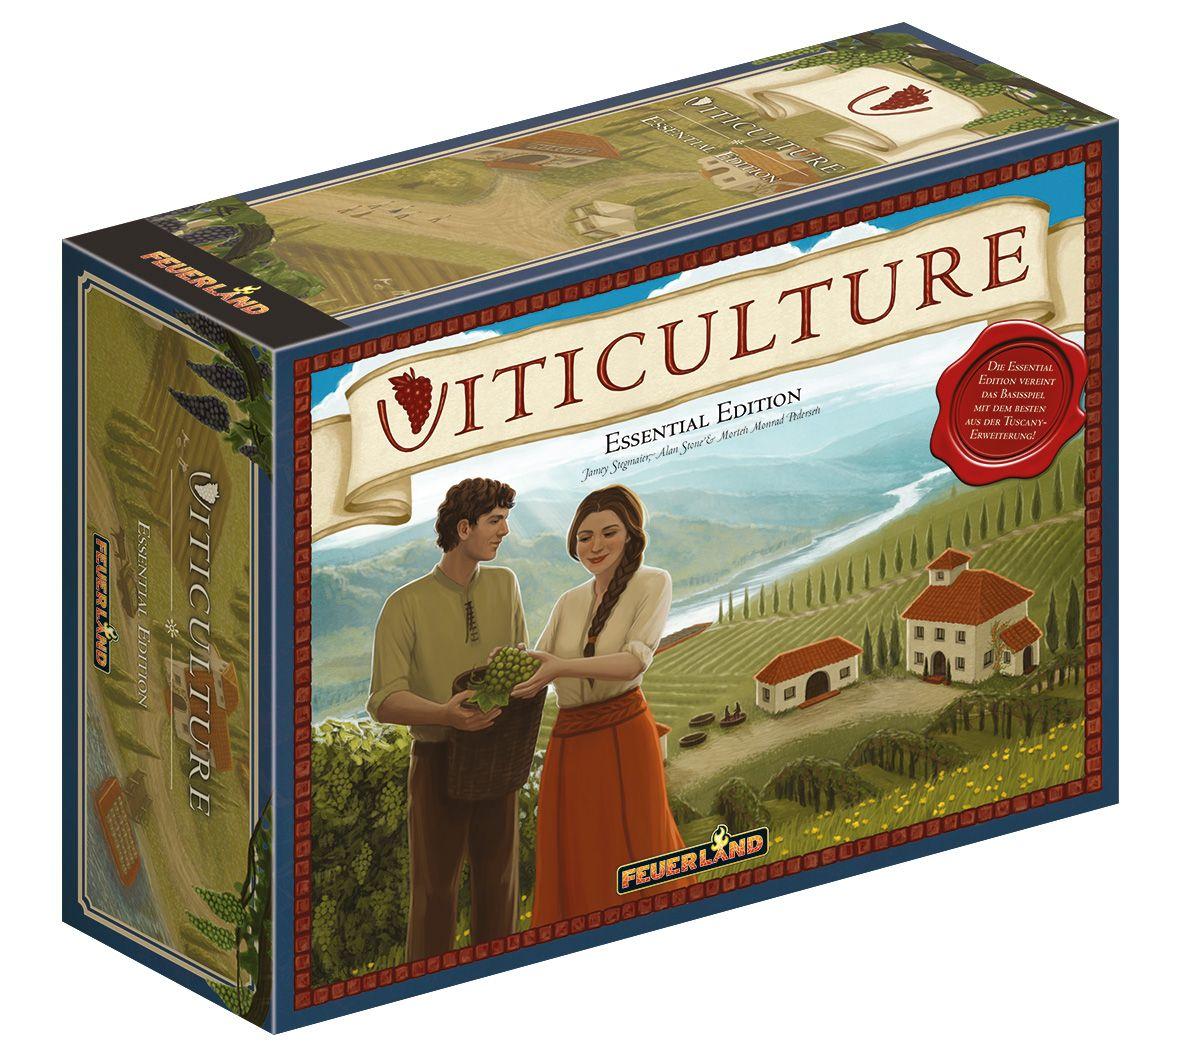 Viticulture_Schachtel_Copyright- Feuerland